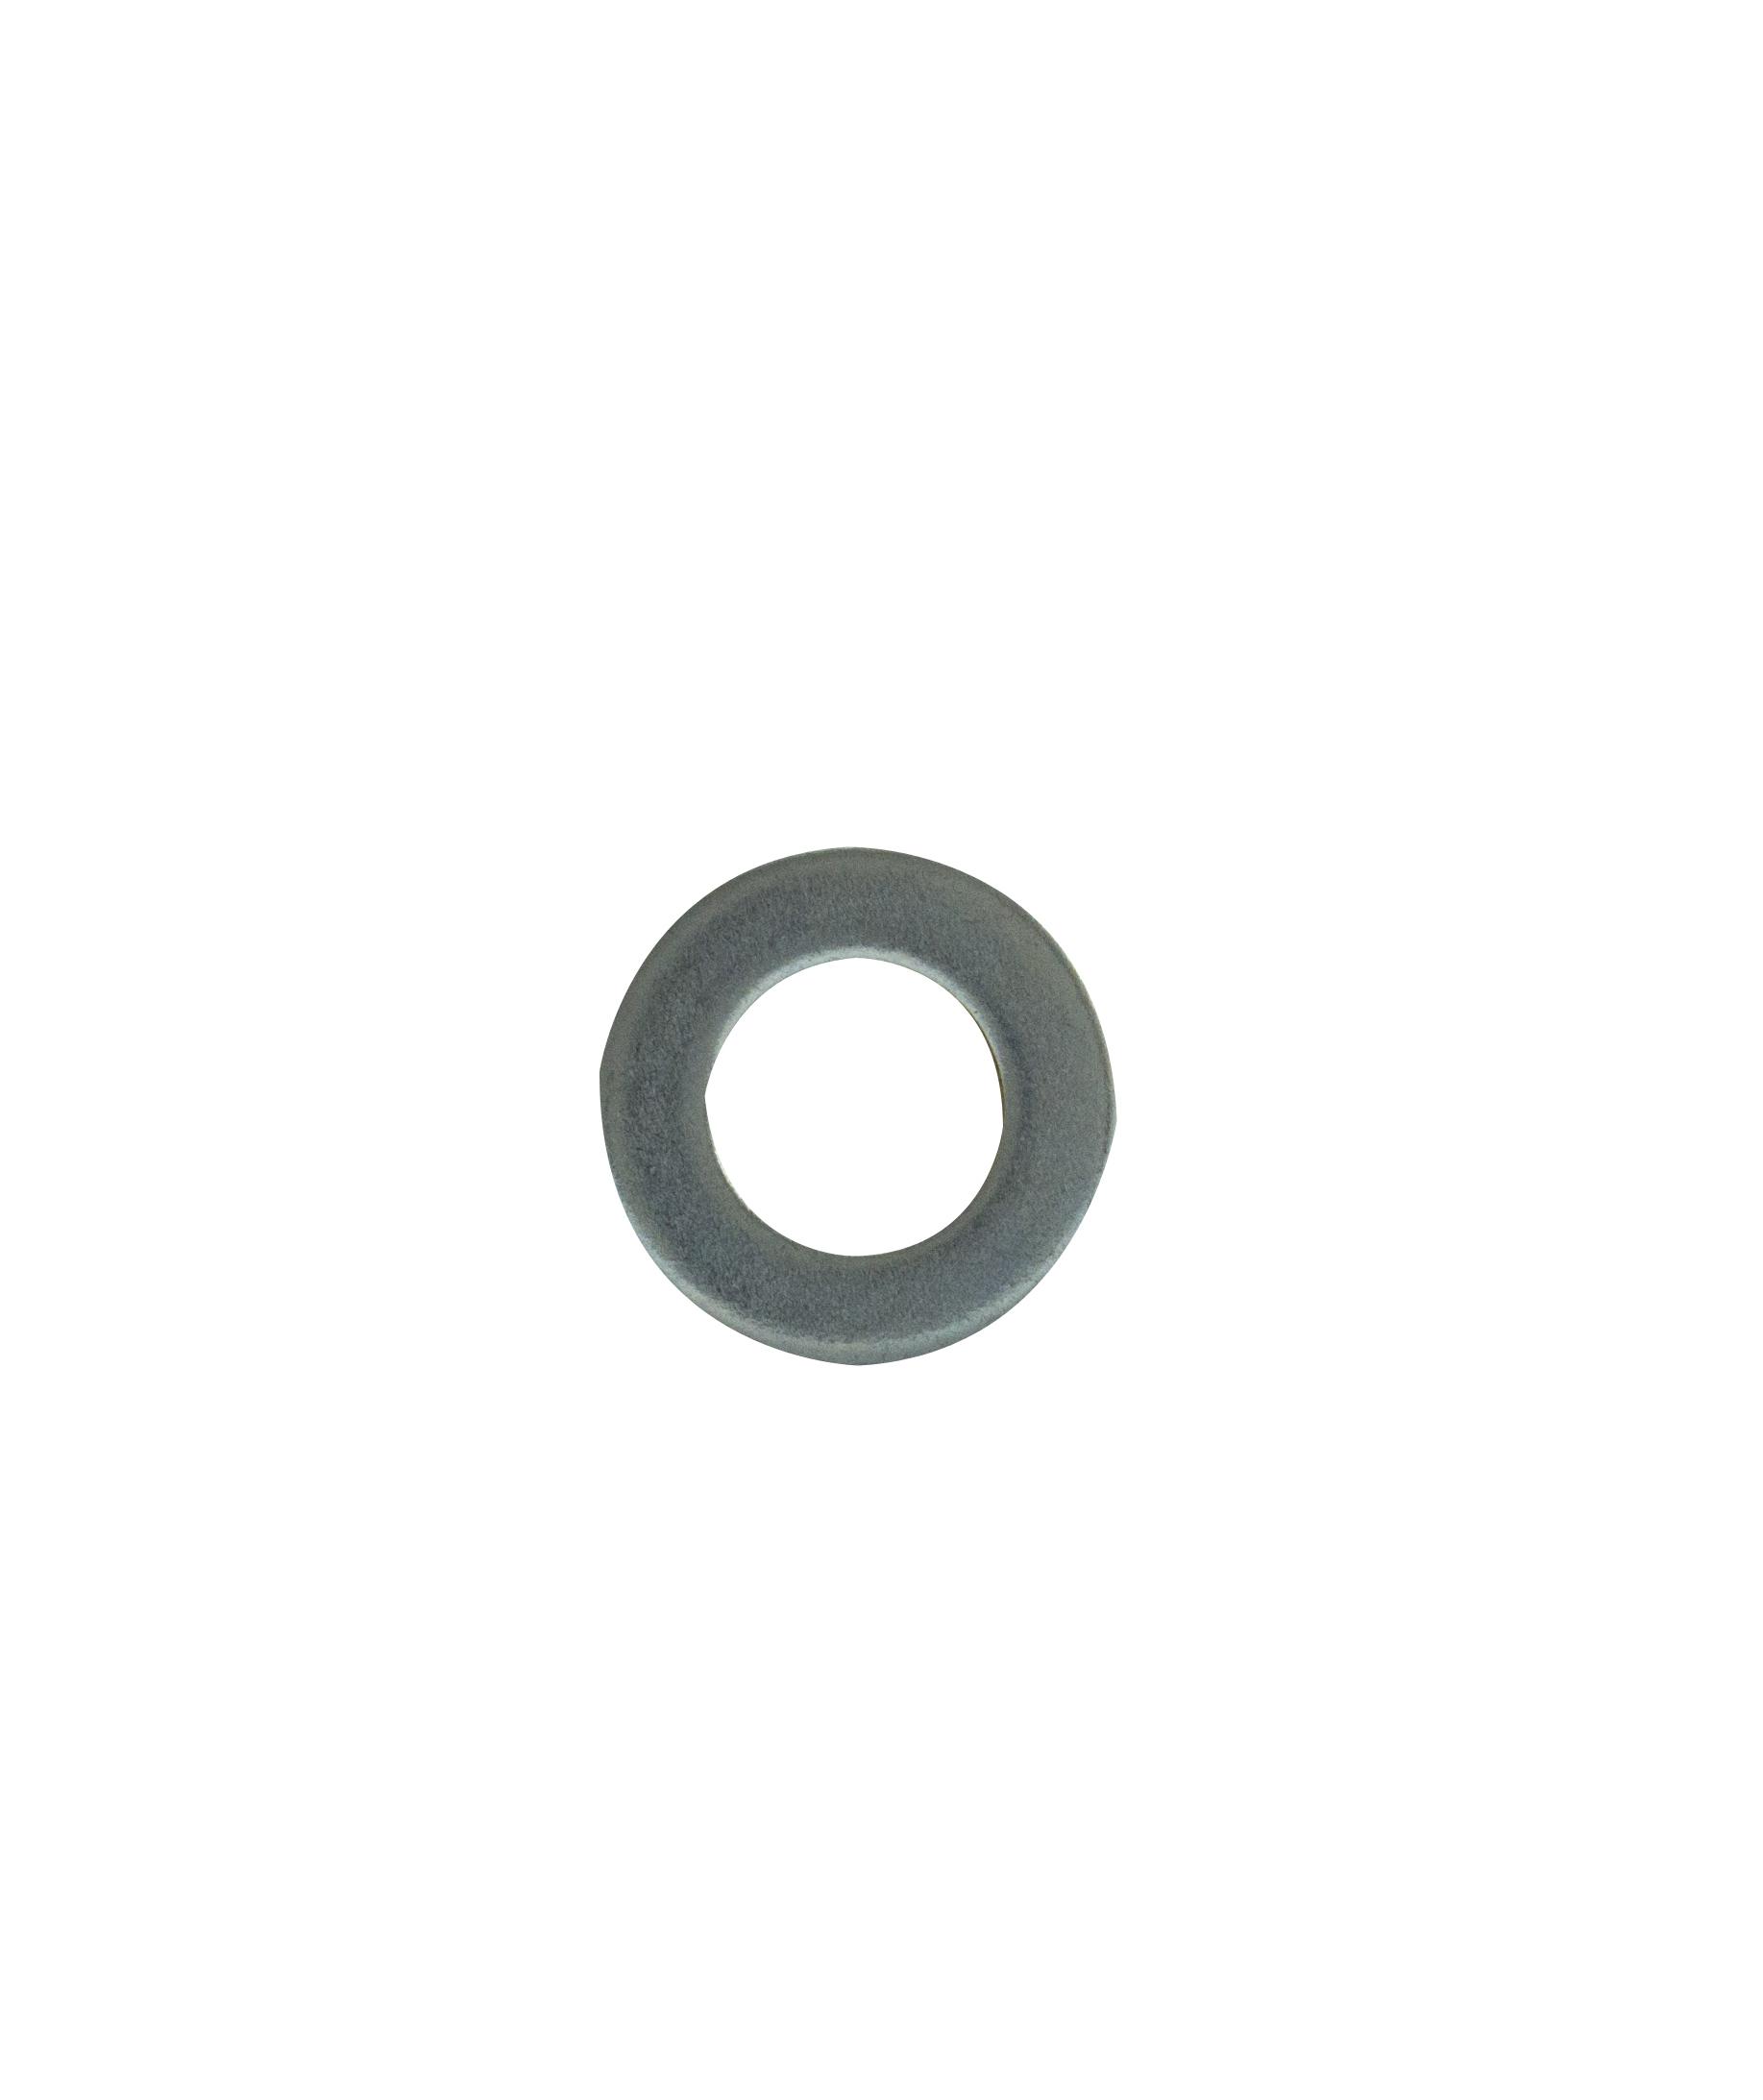 M16 Metric Flat Washer DIN 125A BZP ***